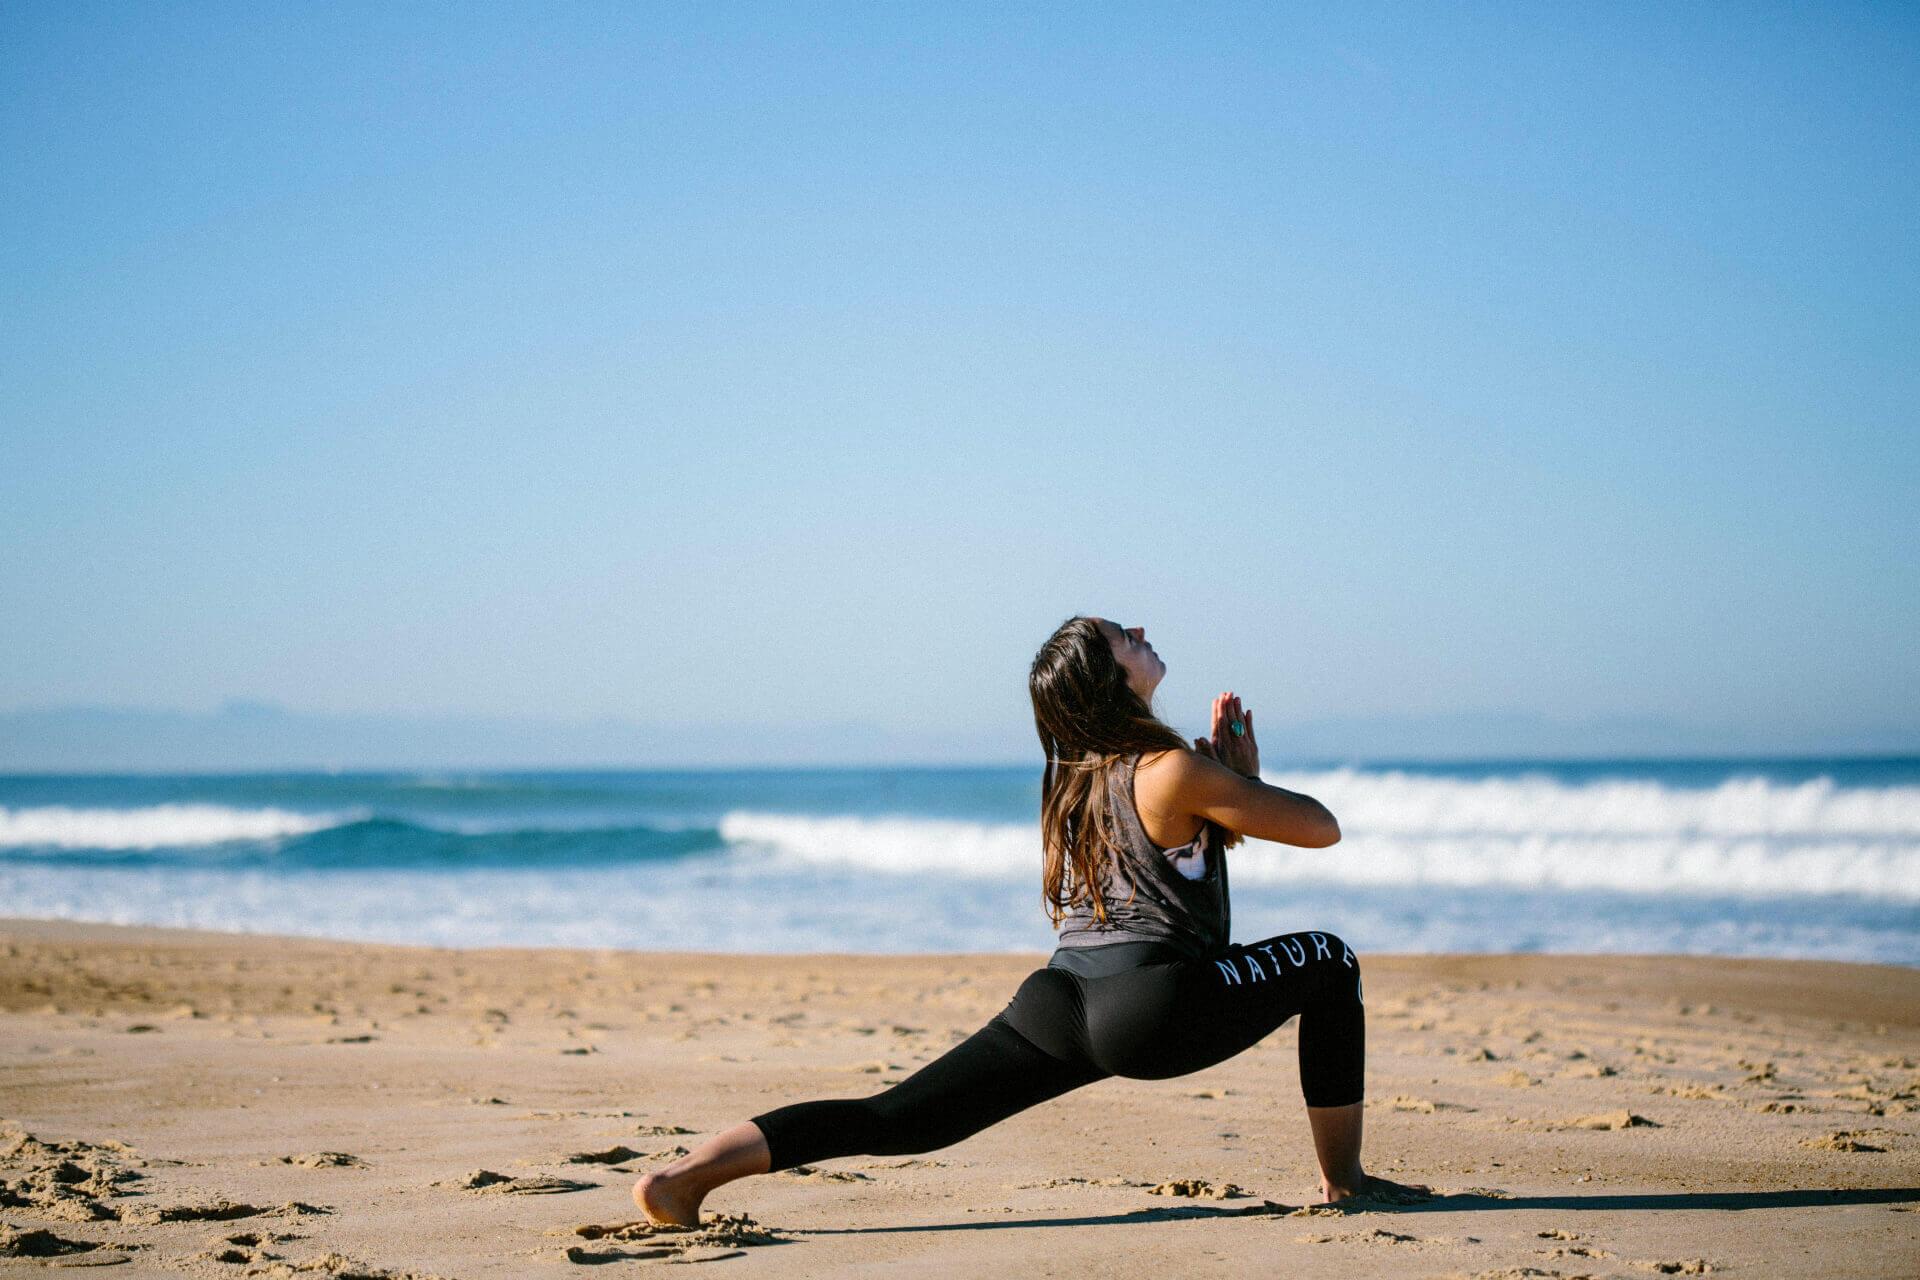 Paola Lasaosa - Cours de Yoga sur la plage de Seignosse Hossegor, Landes